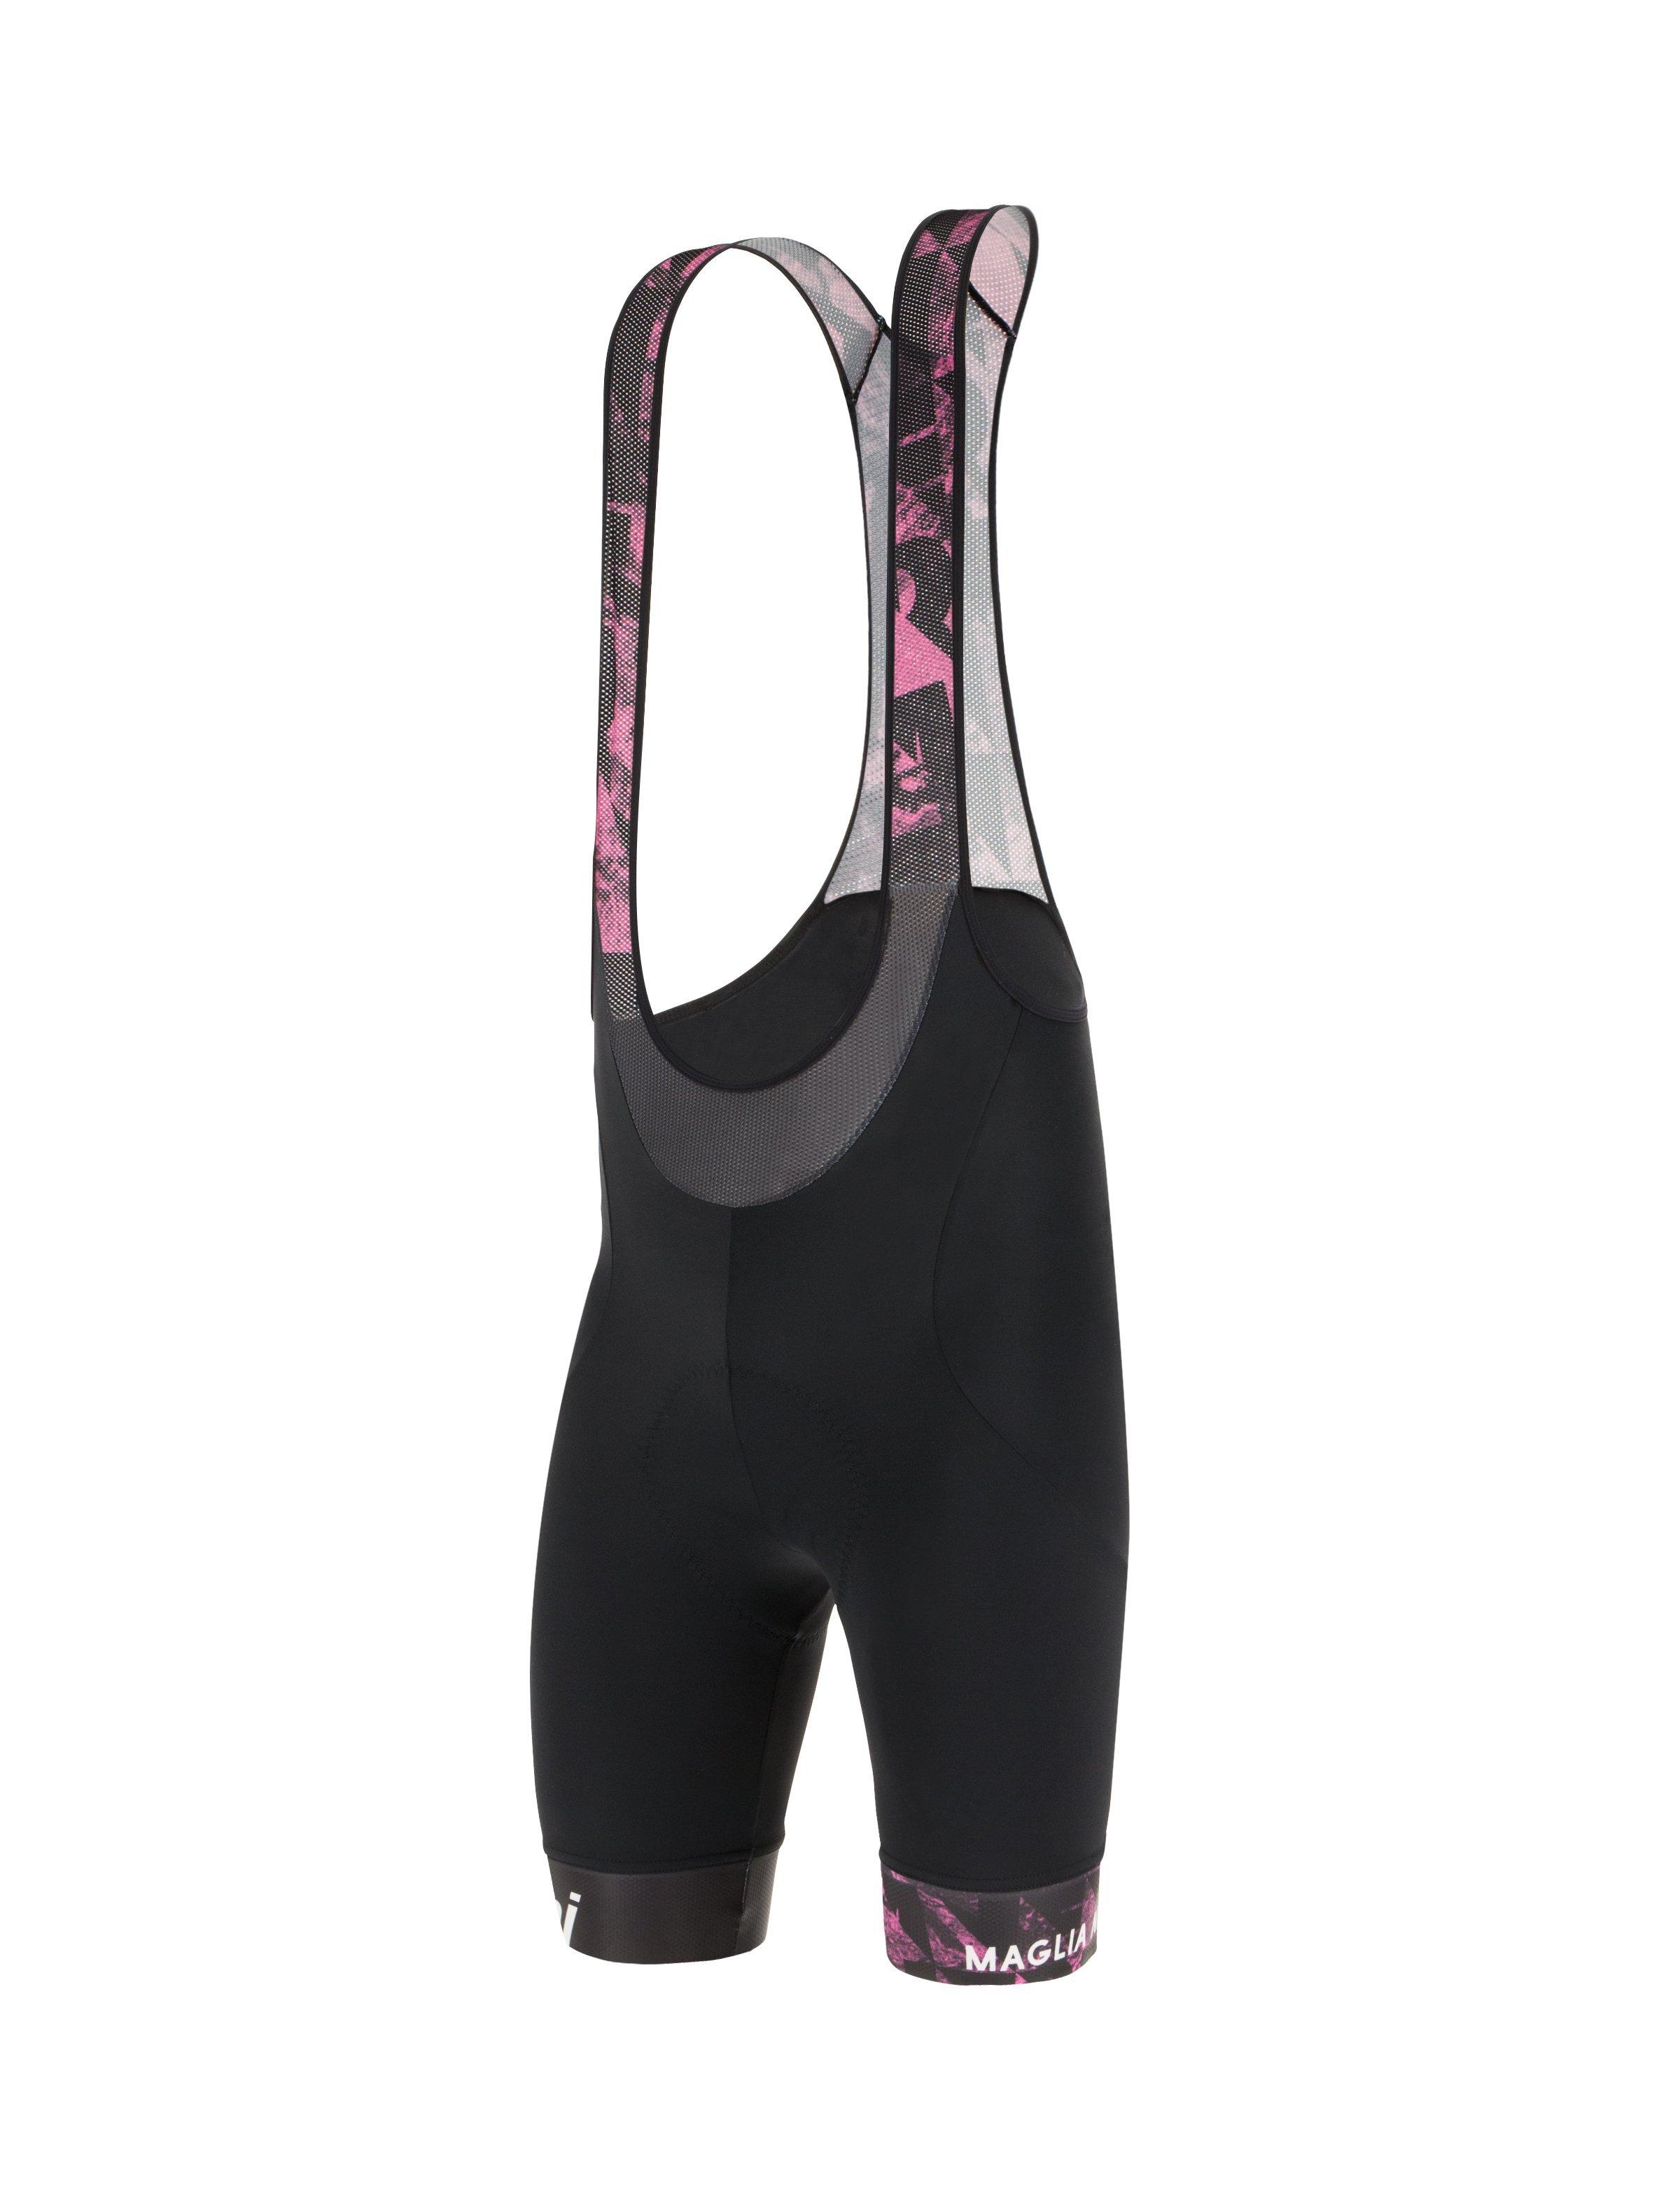 2017 Giro d/'Italia Stage 16 Cima Coppi Cuissard Cyclisme-par Santini